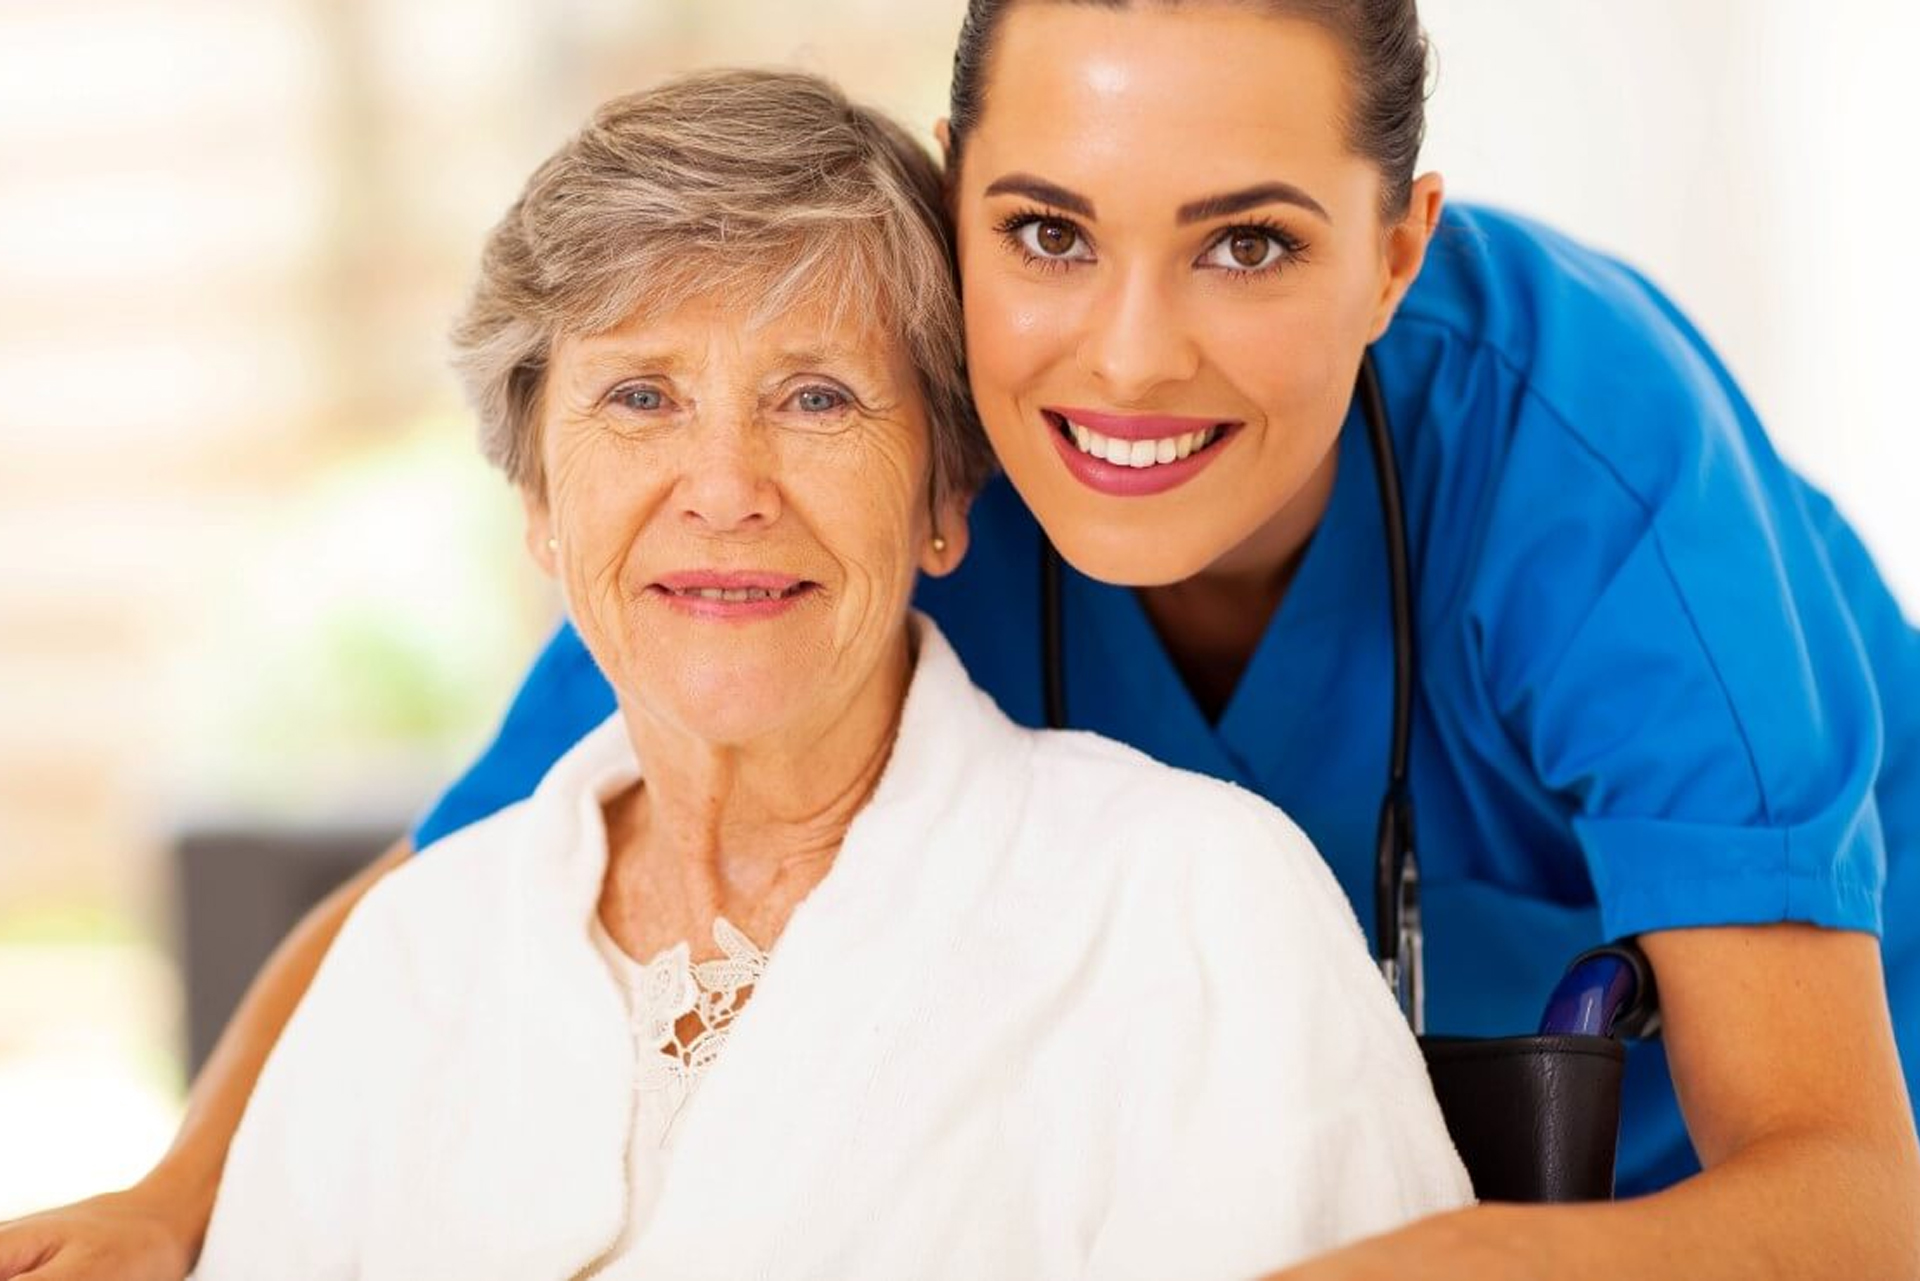 patient in wheelchair with nurse